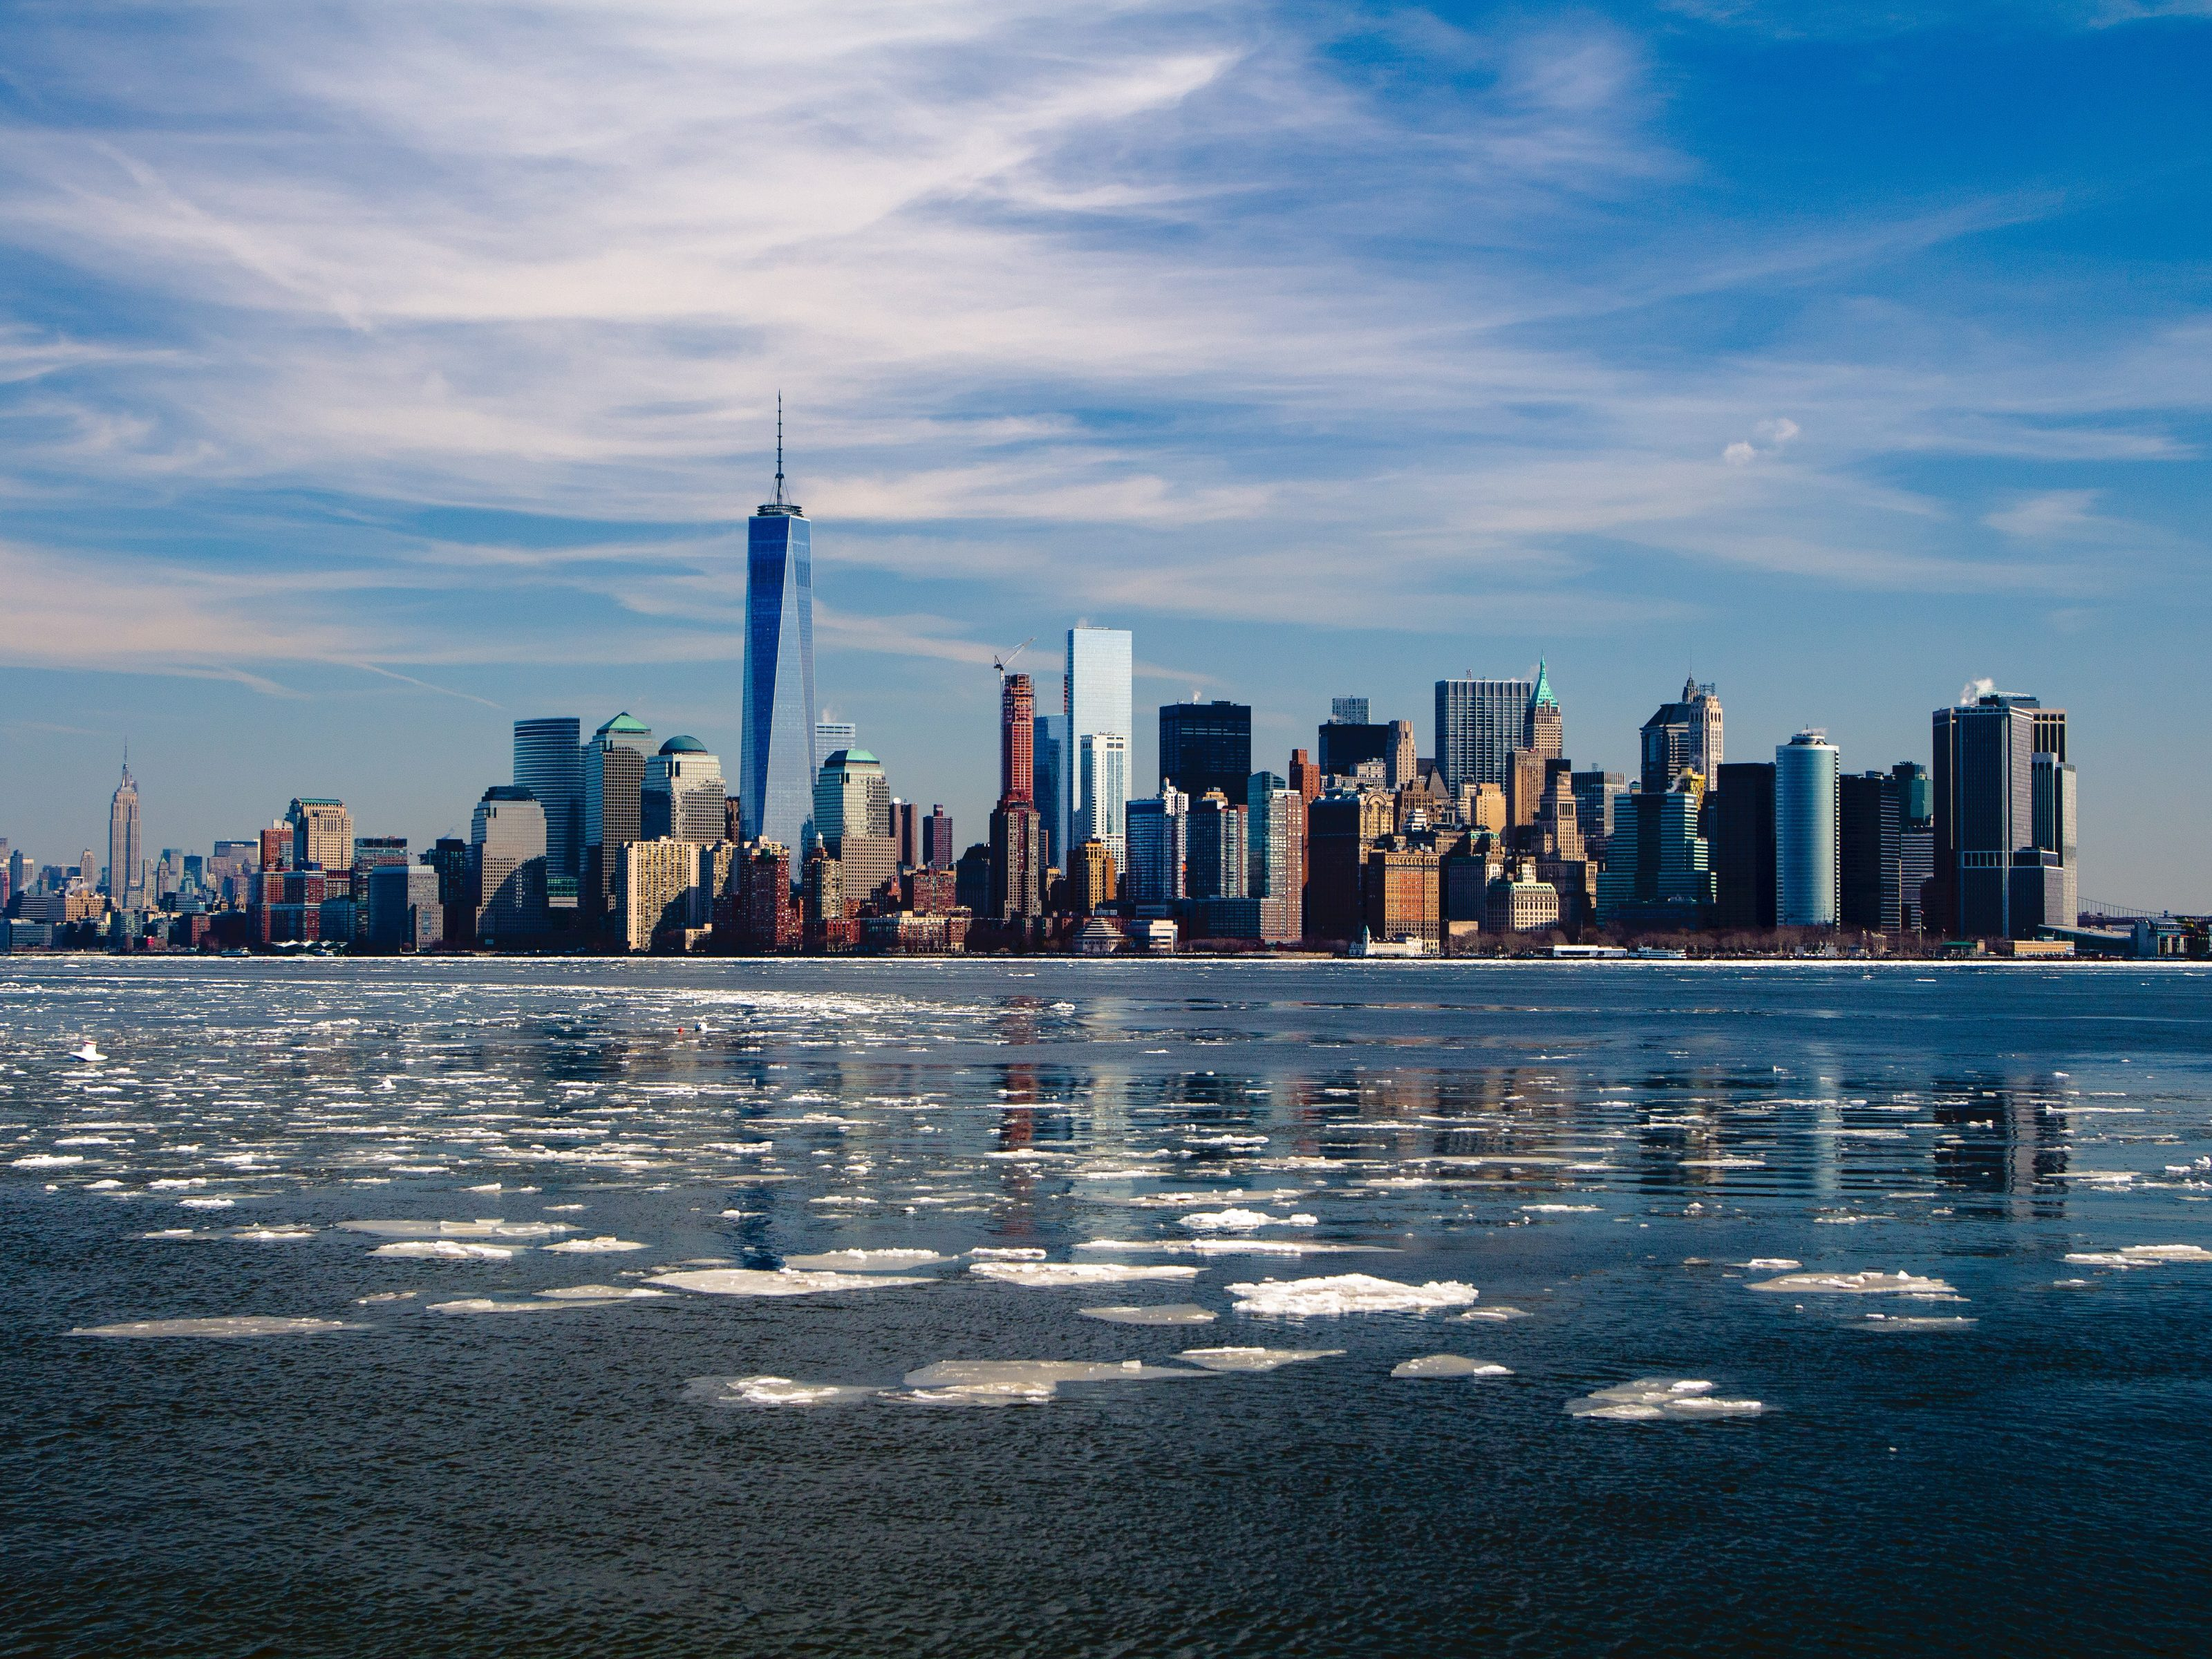 New York Skyscraper Skyline - HD Wallpaper